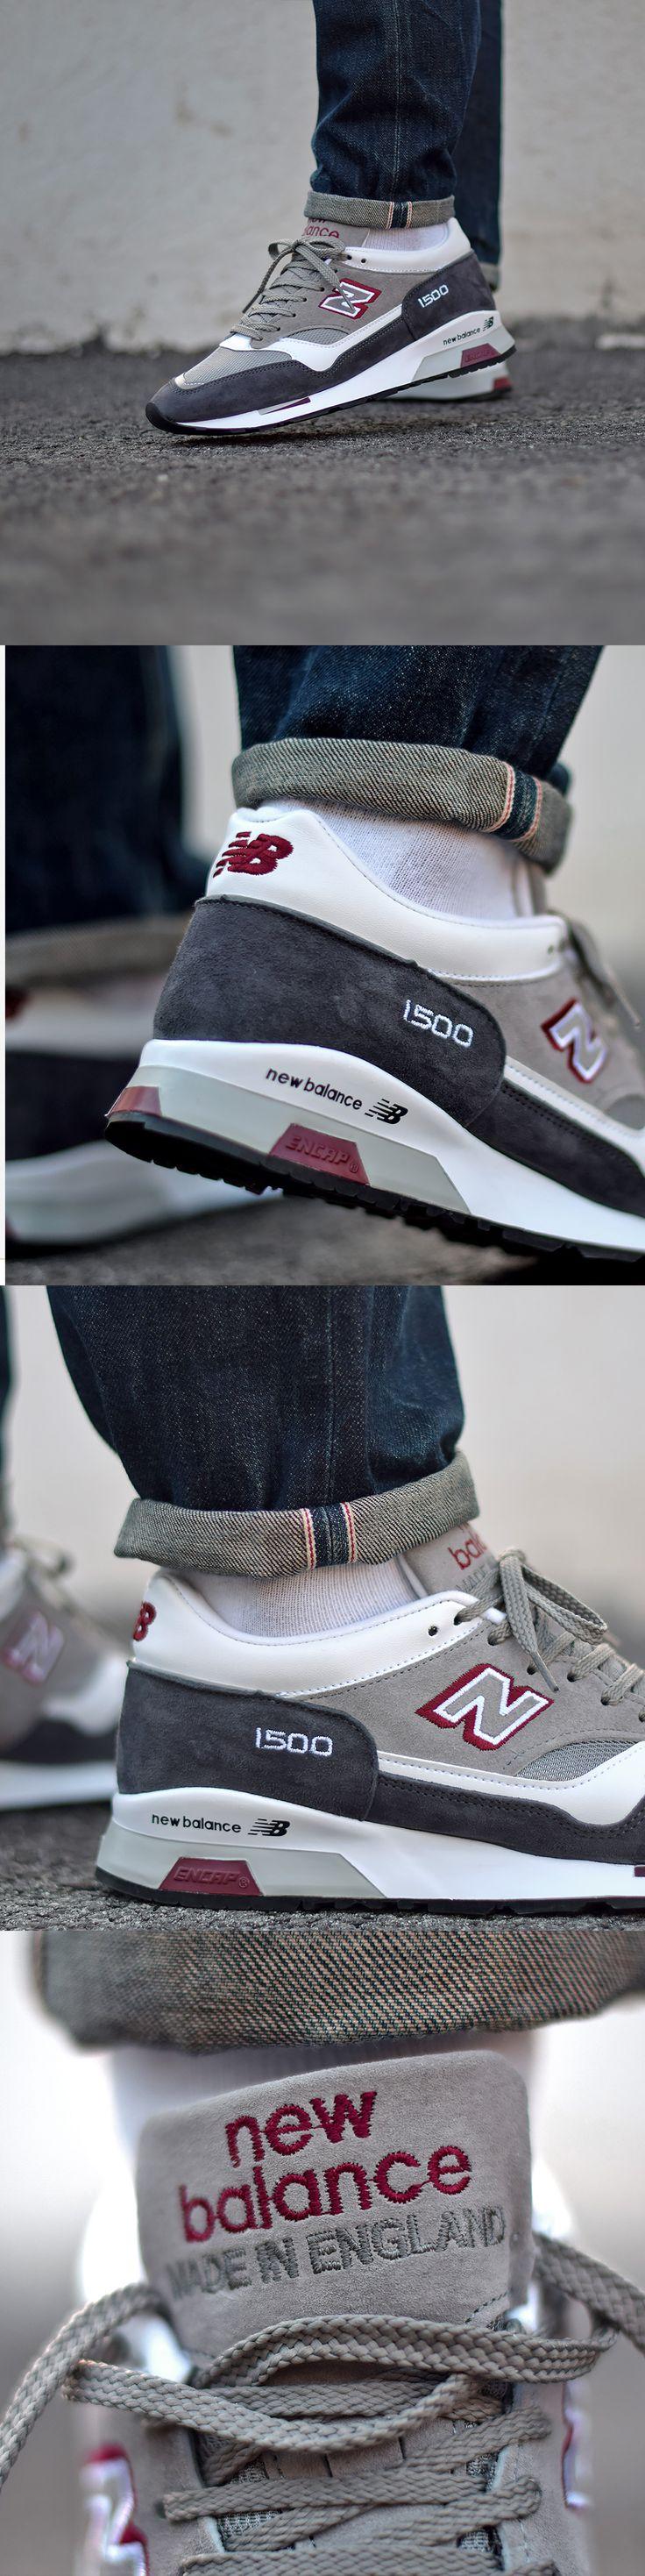 new balance 1500 skor